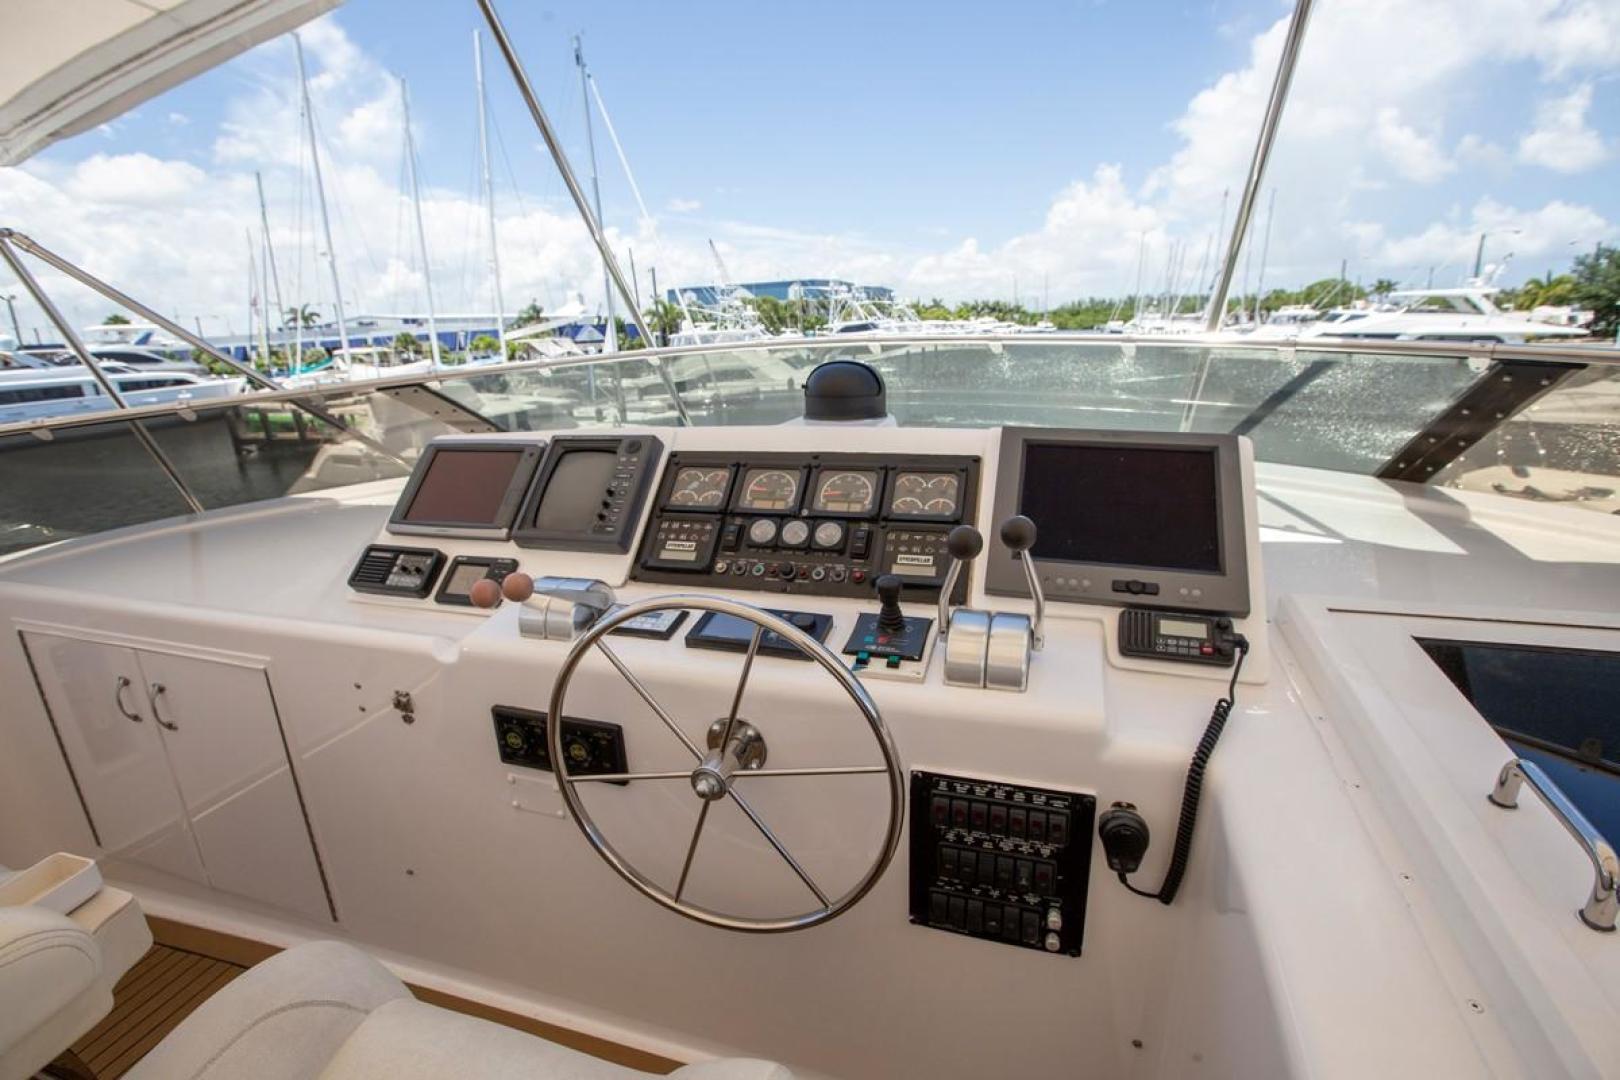 Hatteras-Cockpit Motor Yacht 2000-Getaway Ft. Lauderdale-Florida-United States-977401 | Thumbnail